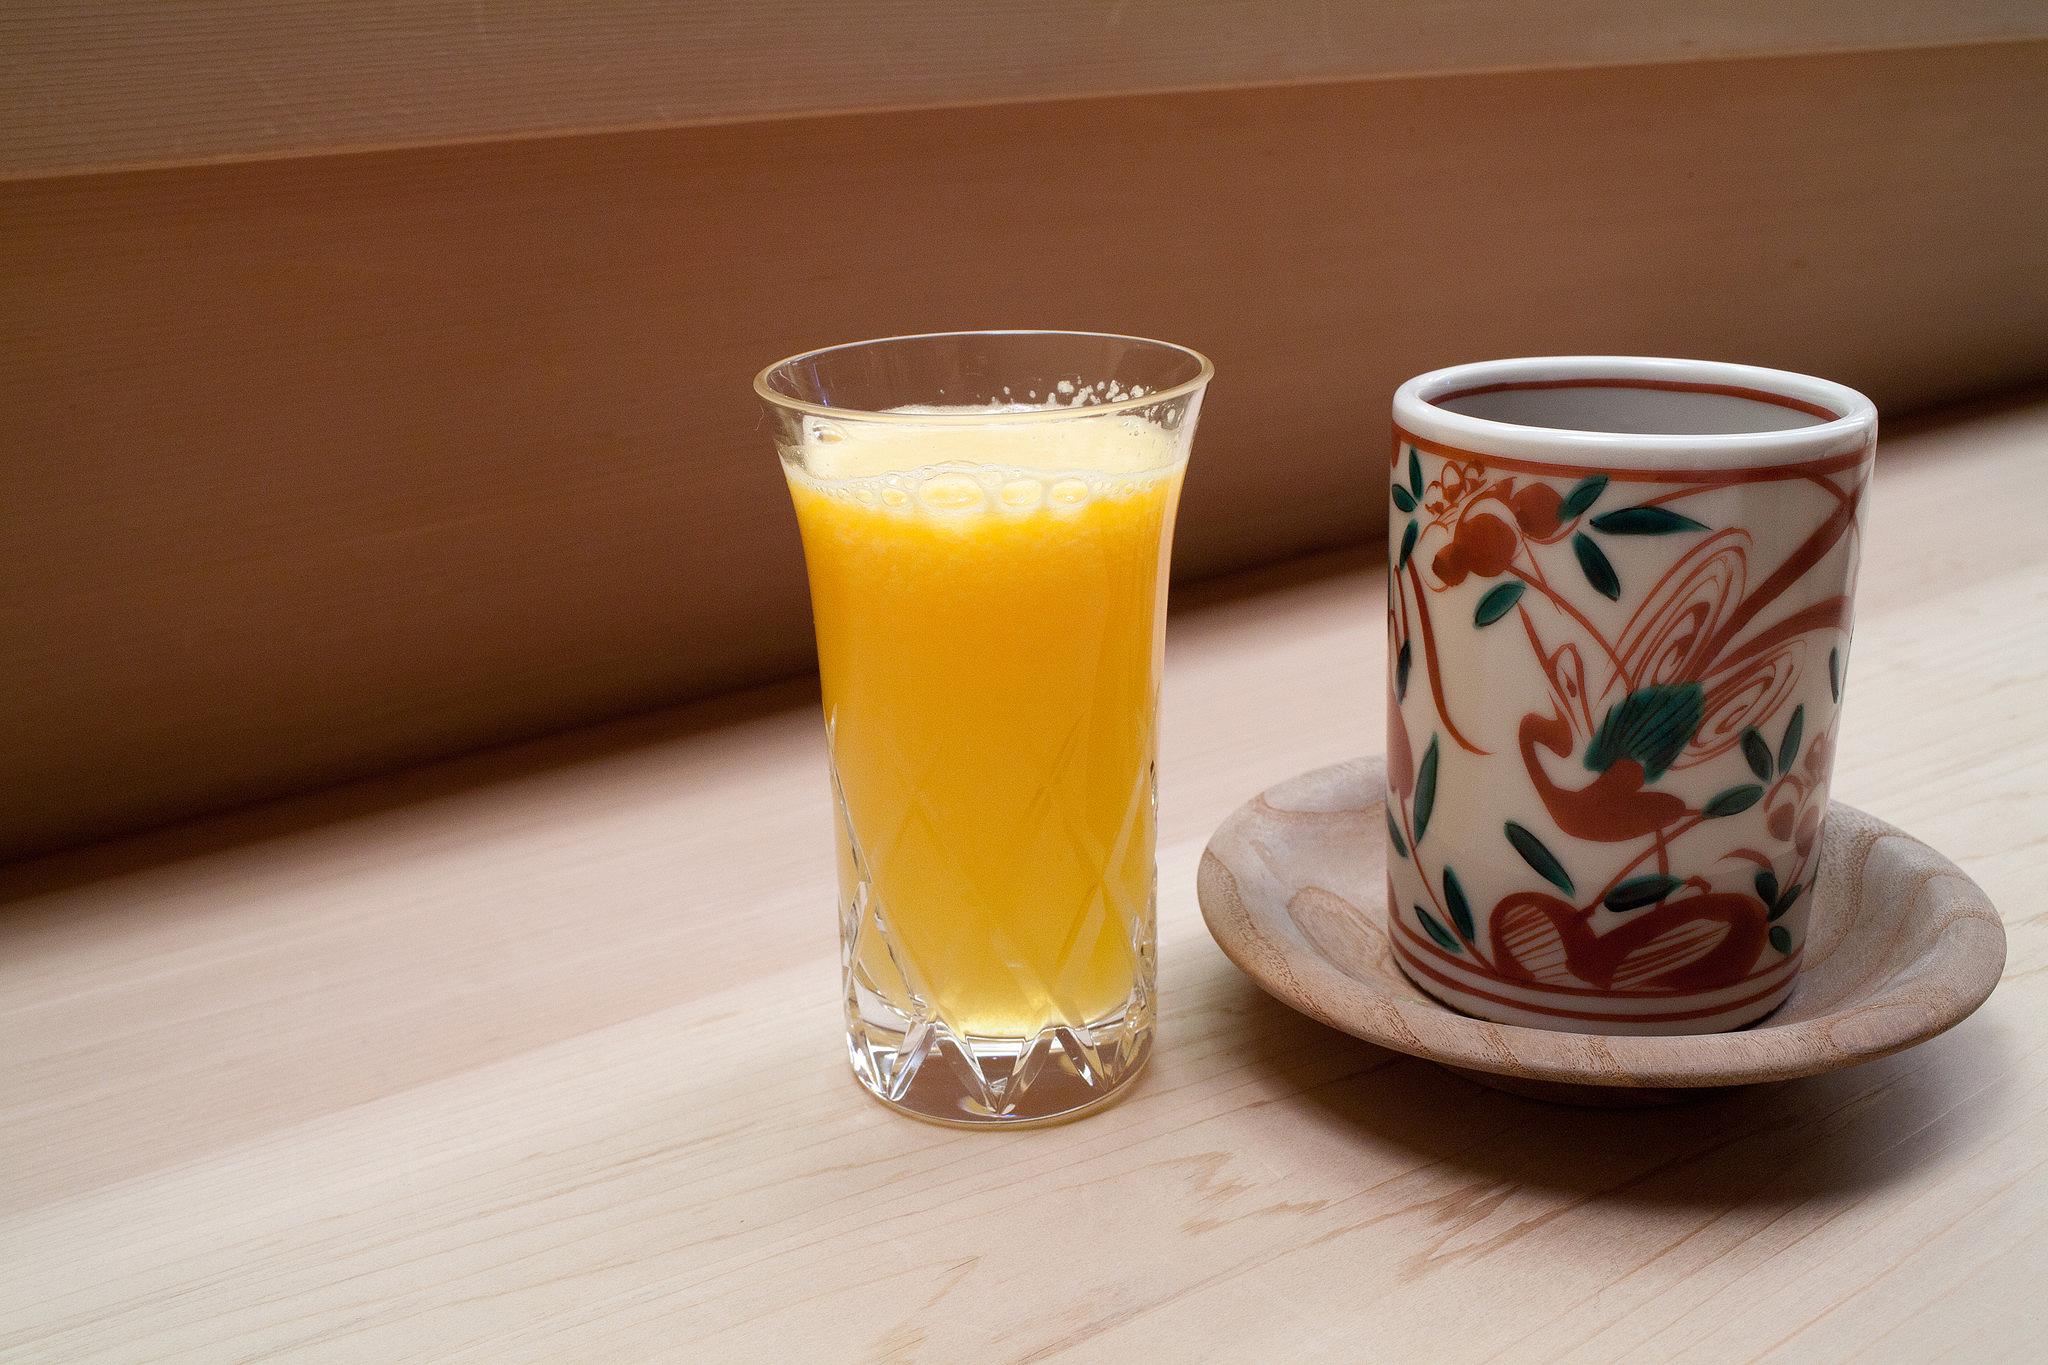 Chihana, Kyoto, Japan - Orange Juice and Green Tea